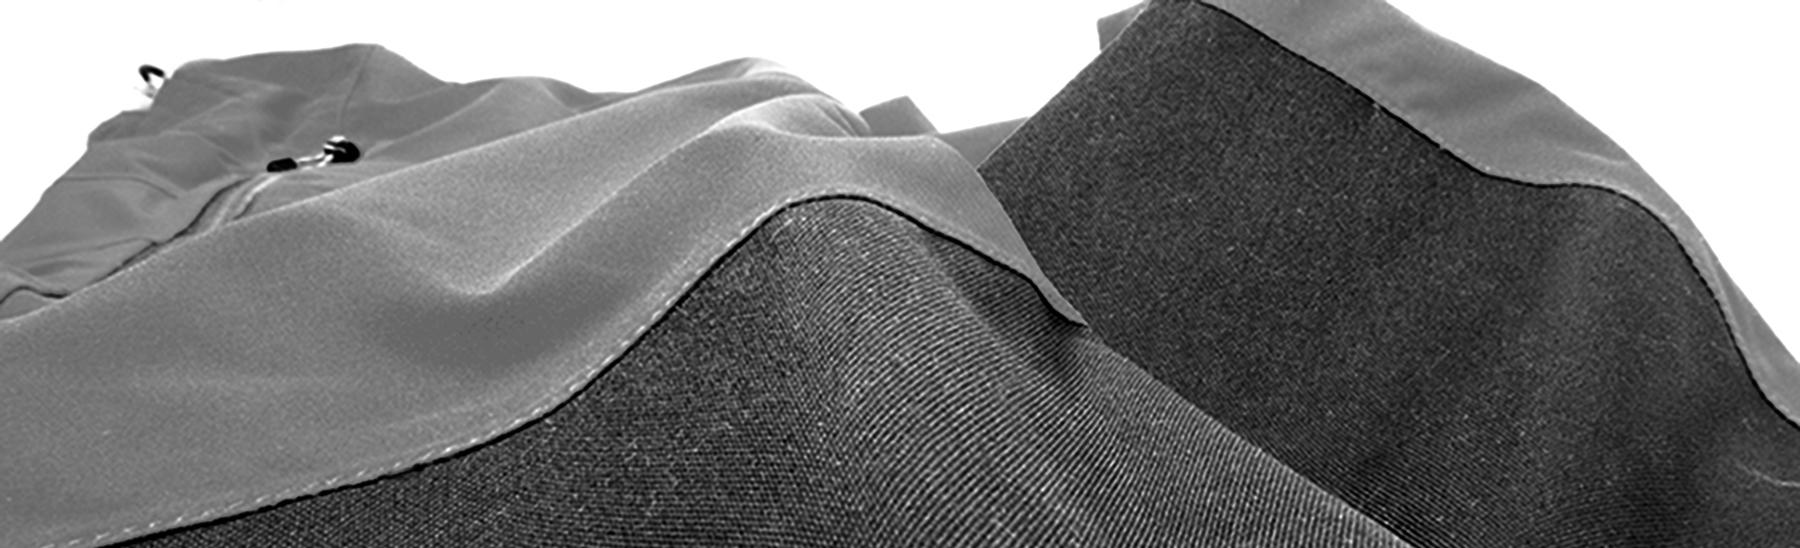 Obermeyer fabrics and materials